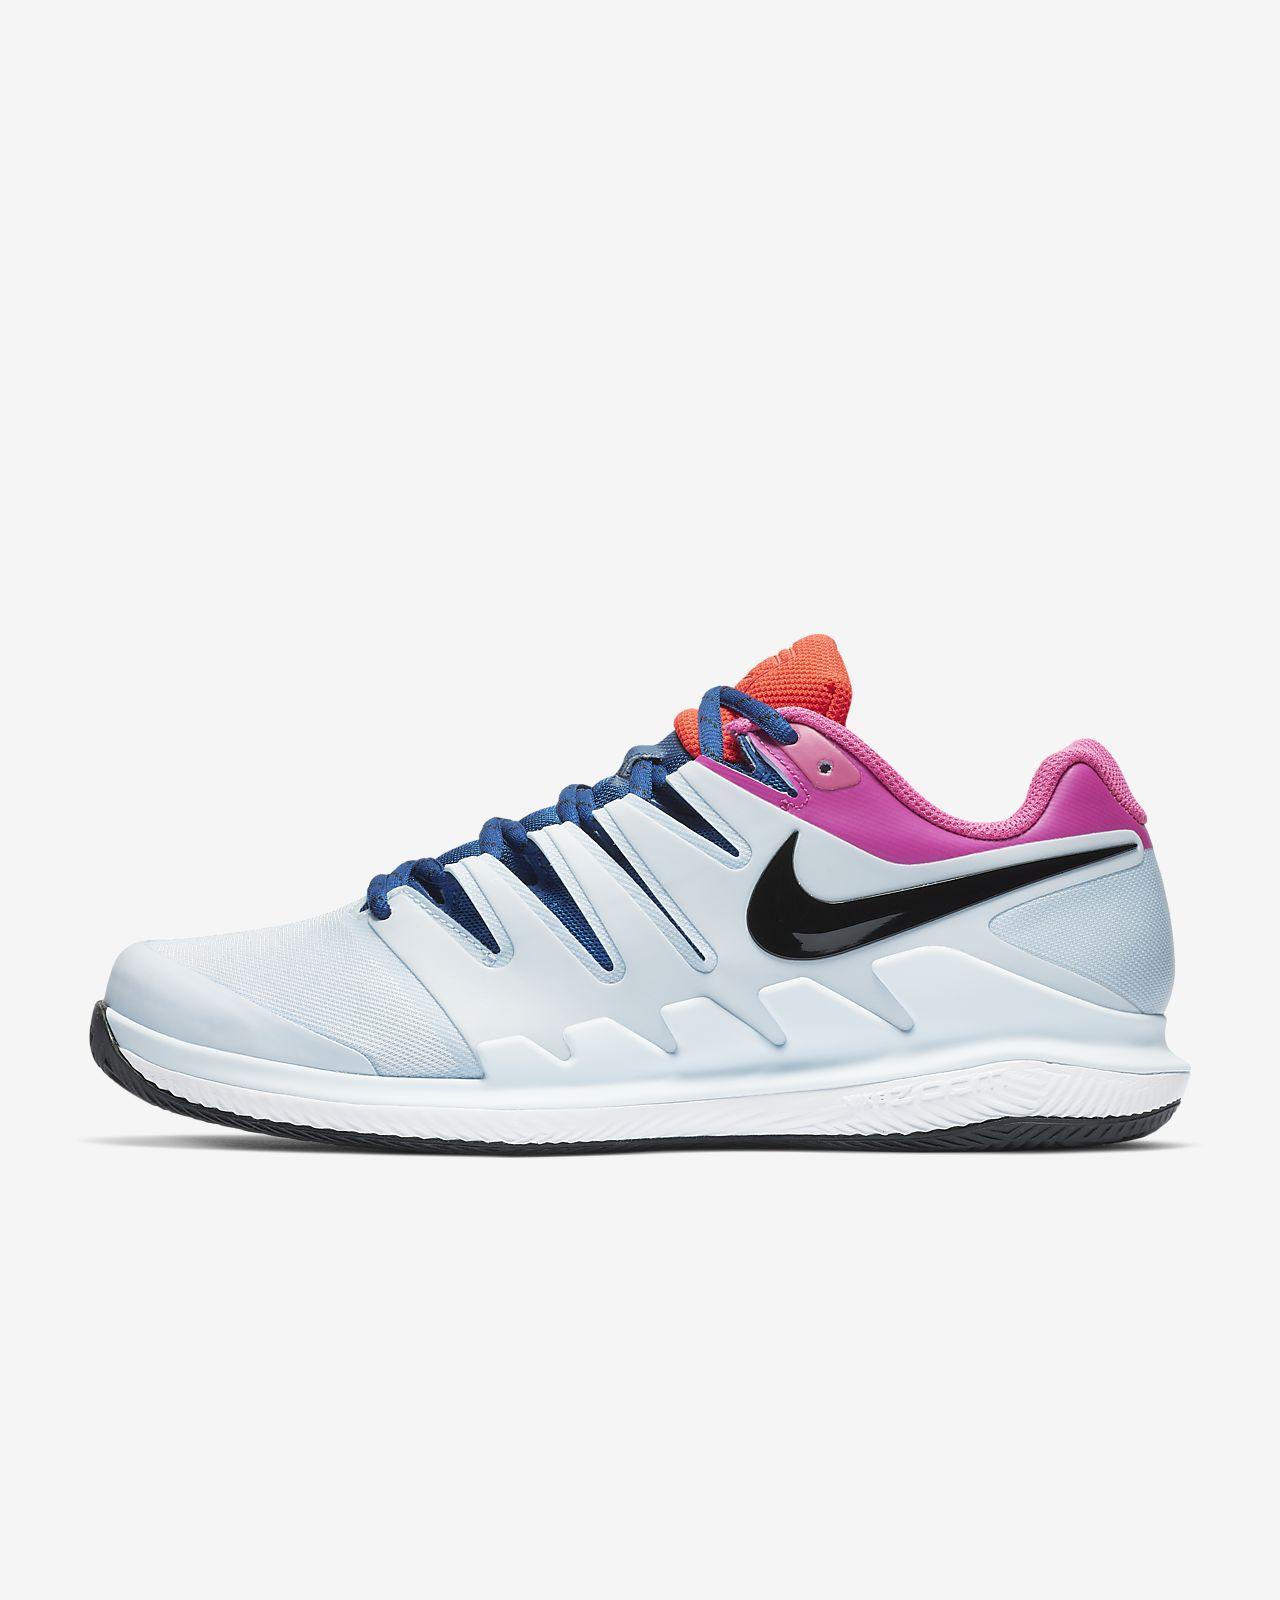 d3f2600a68585 Nike Air Zoom Vapor X Clay Men s Tennis Shoe. Nike.com GB